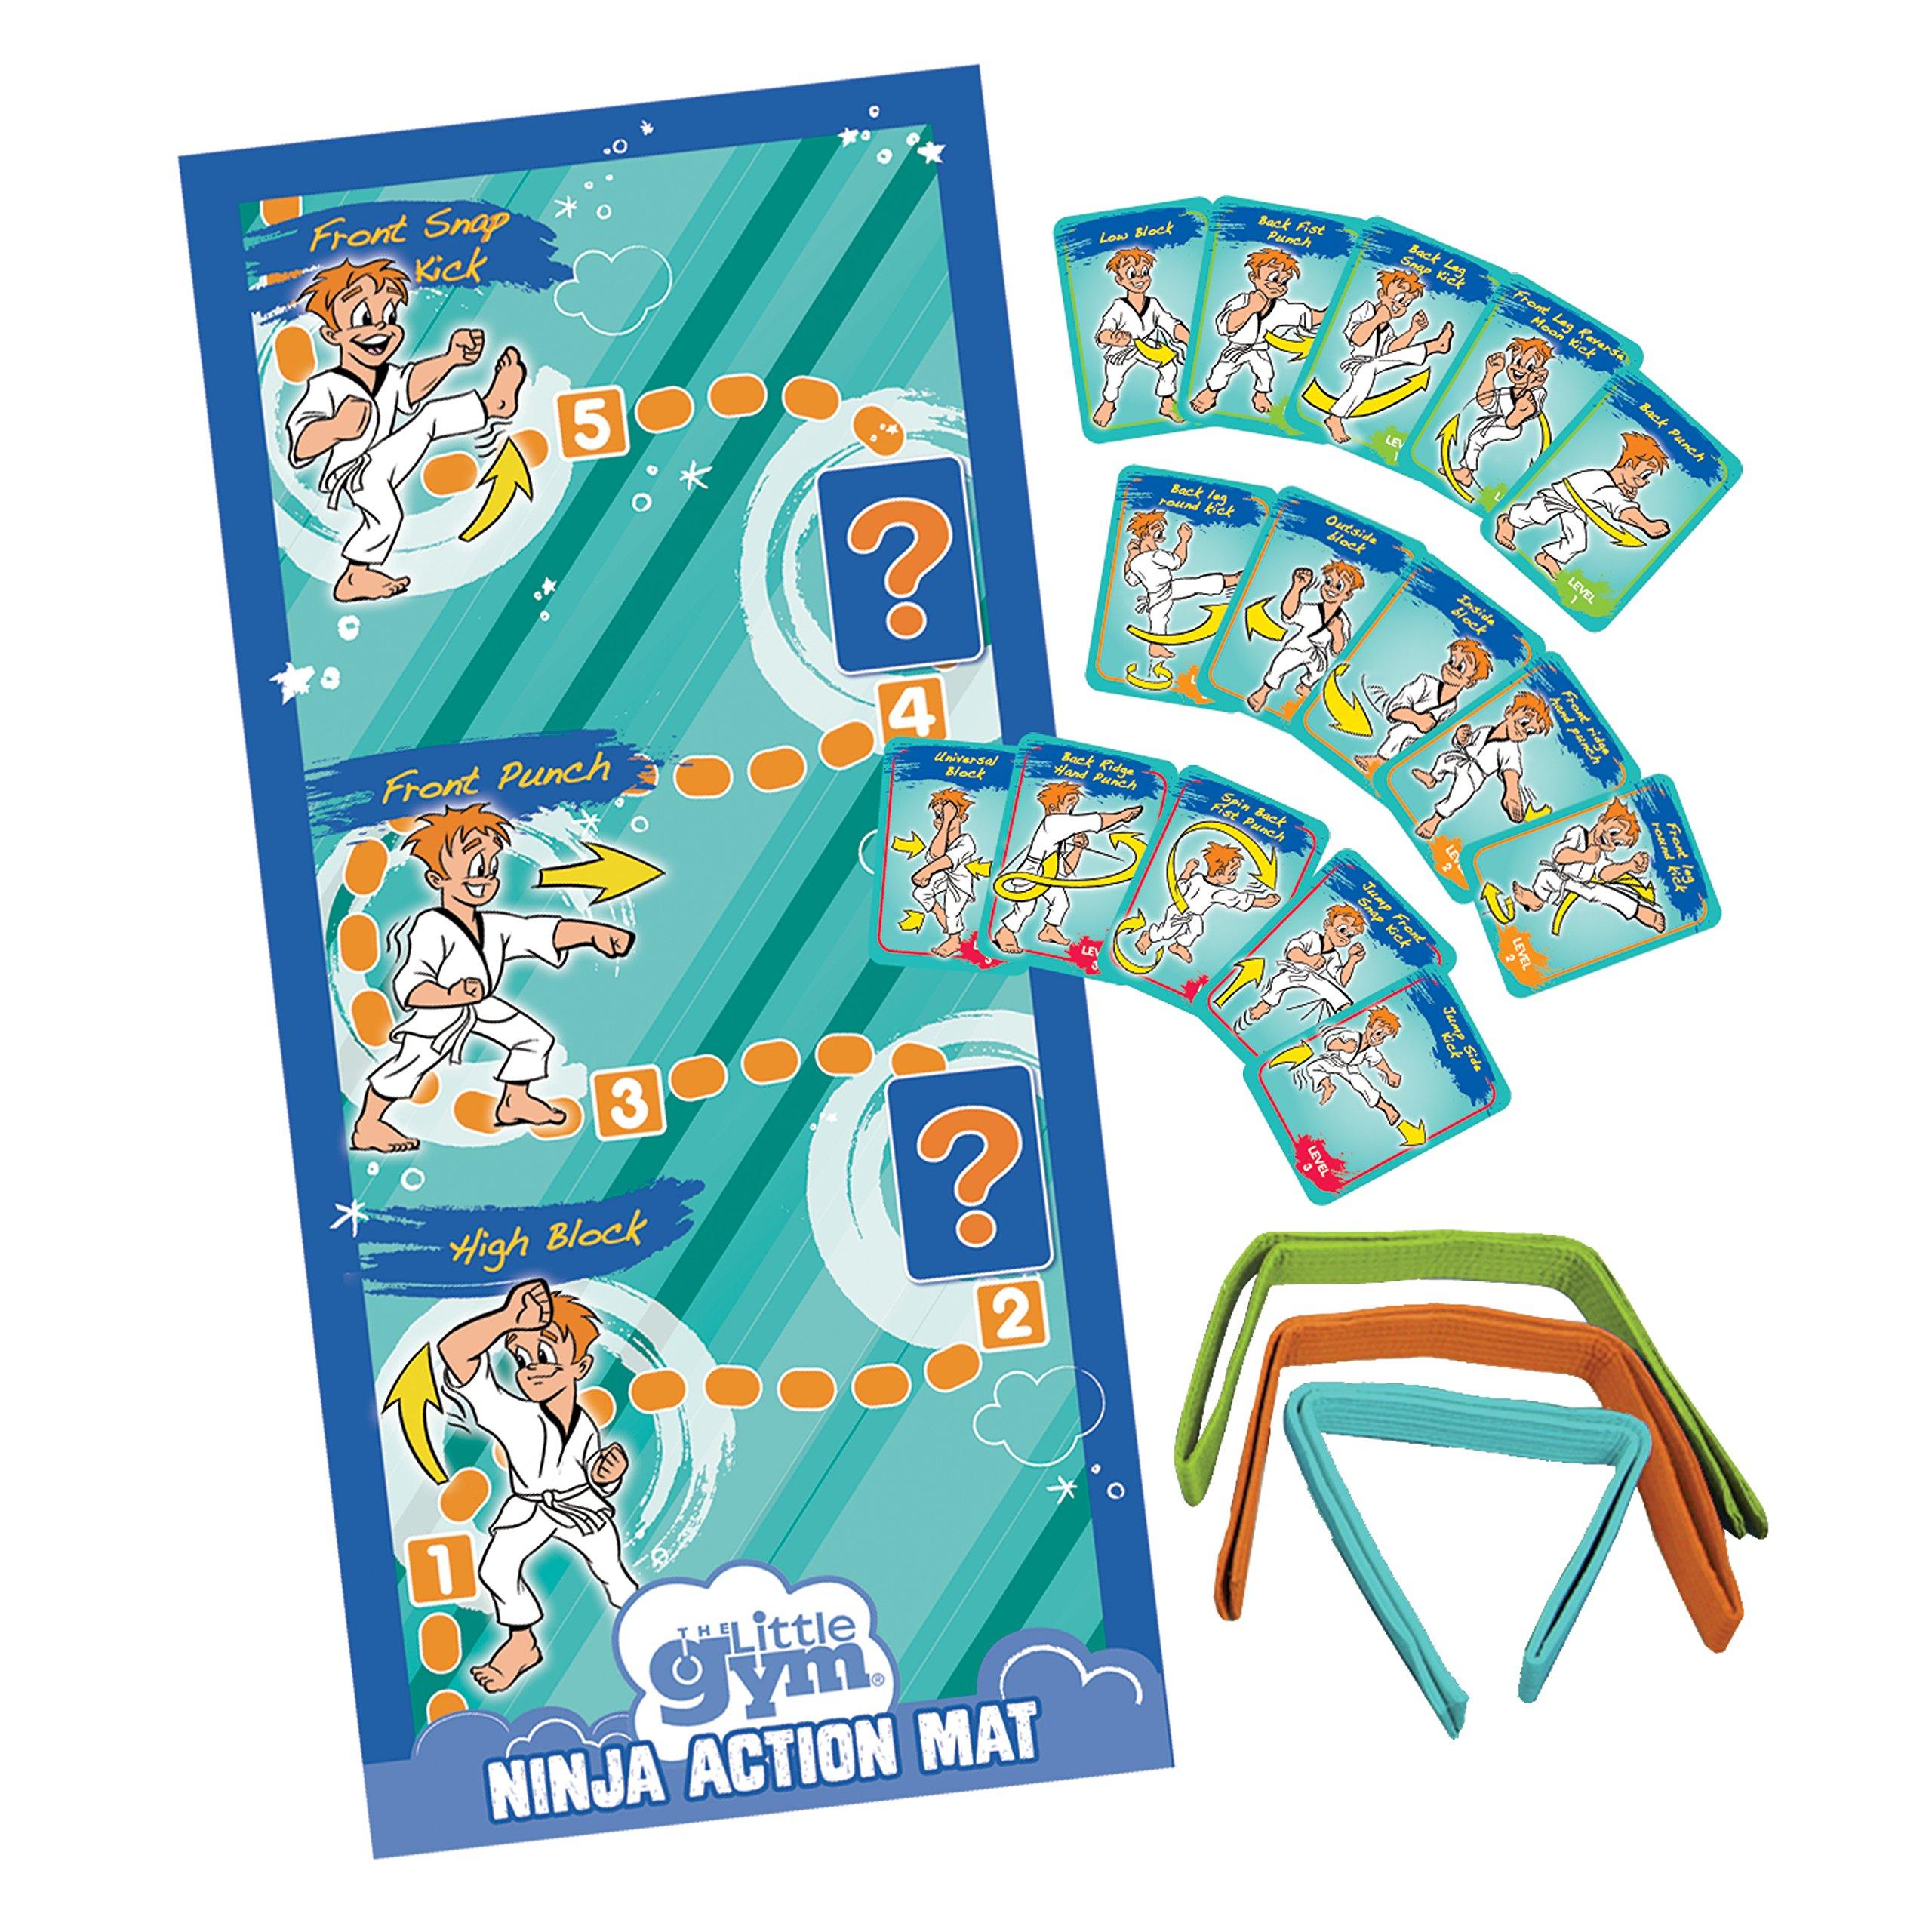 The Little Gym Ninja Action Mat